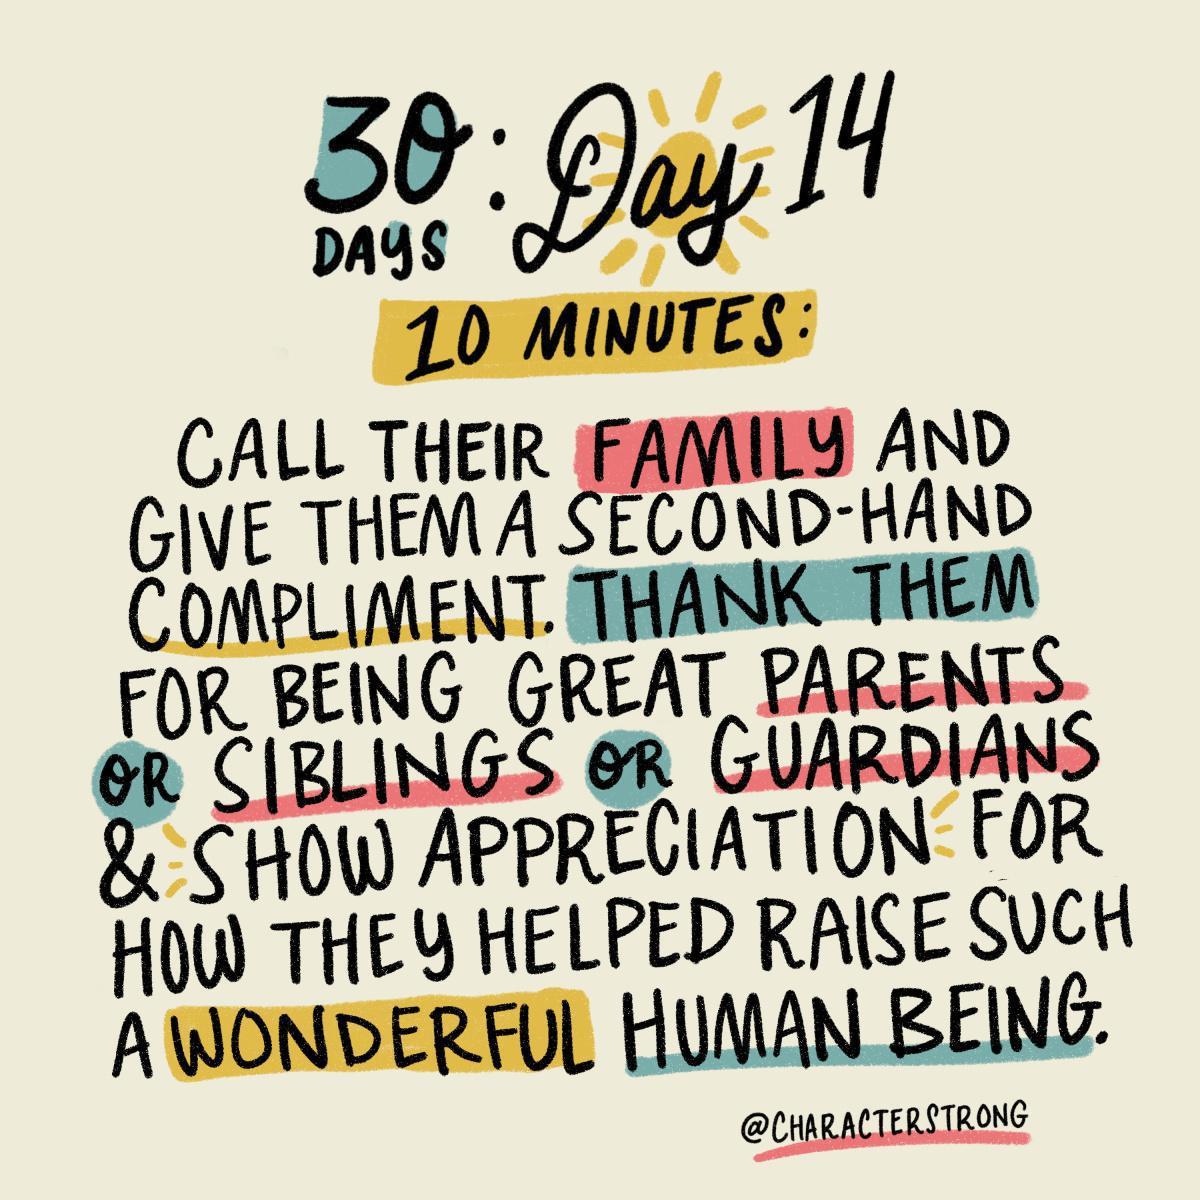 Day 14 Kindness Challenge